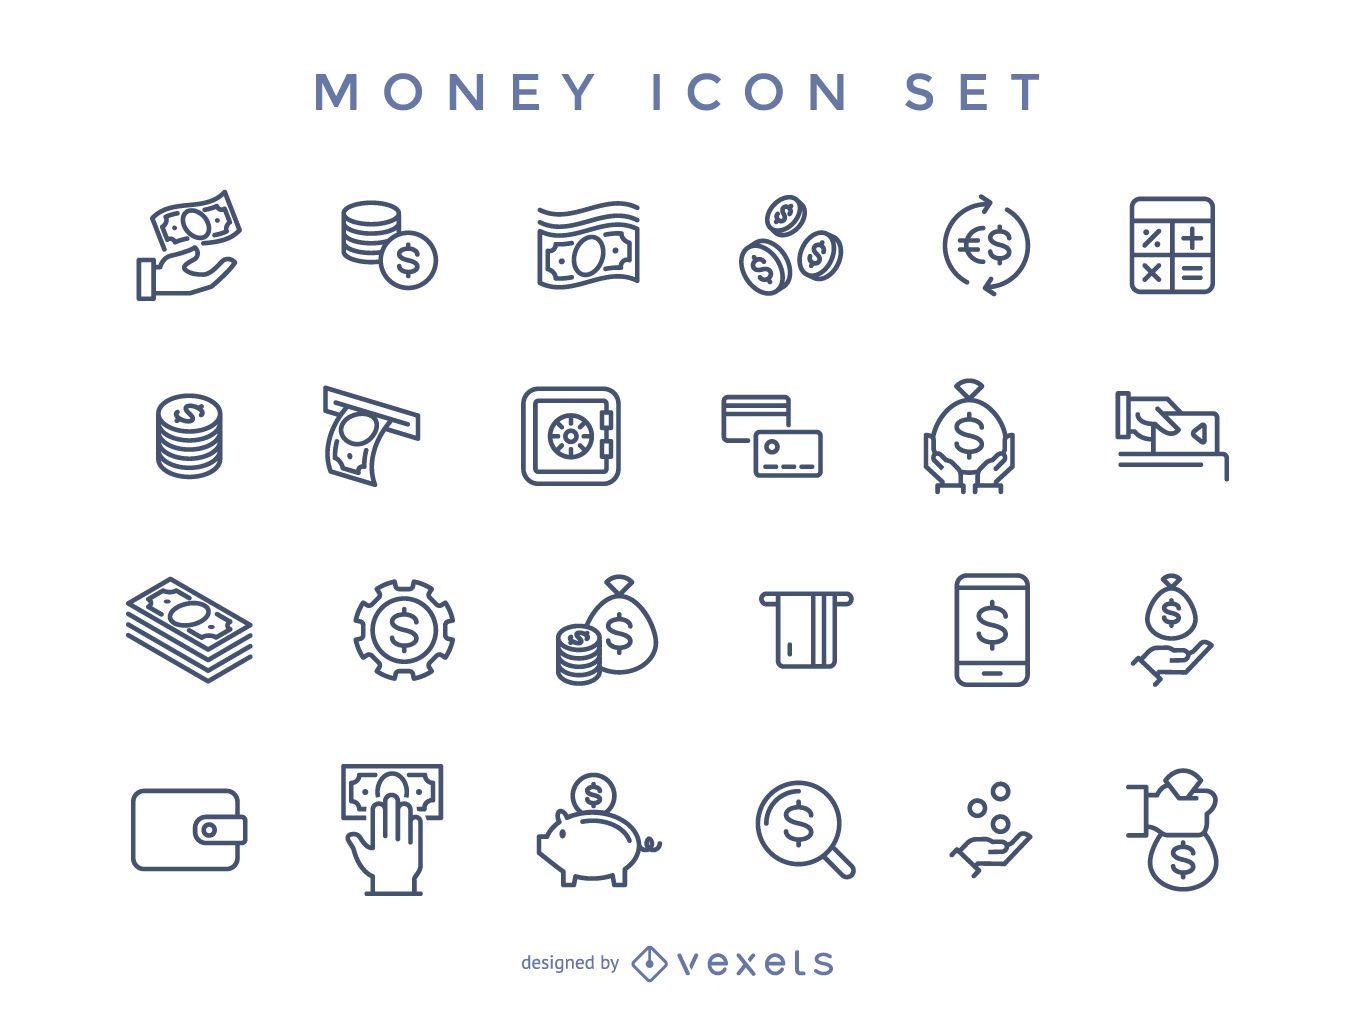 Stroke money icon set